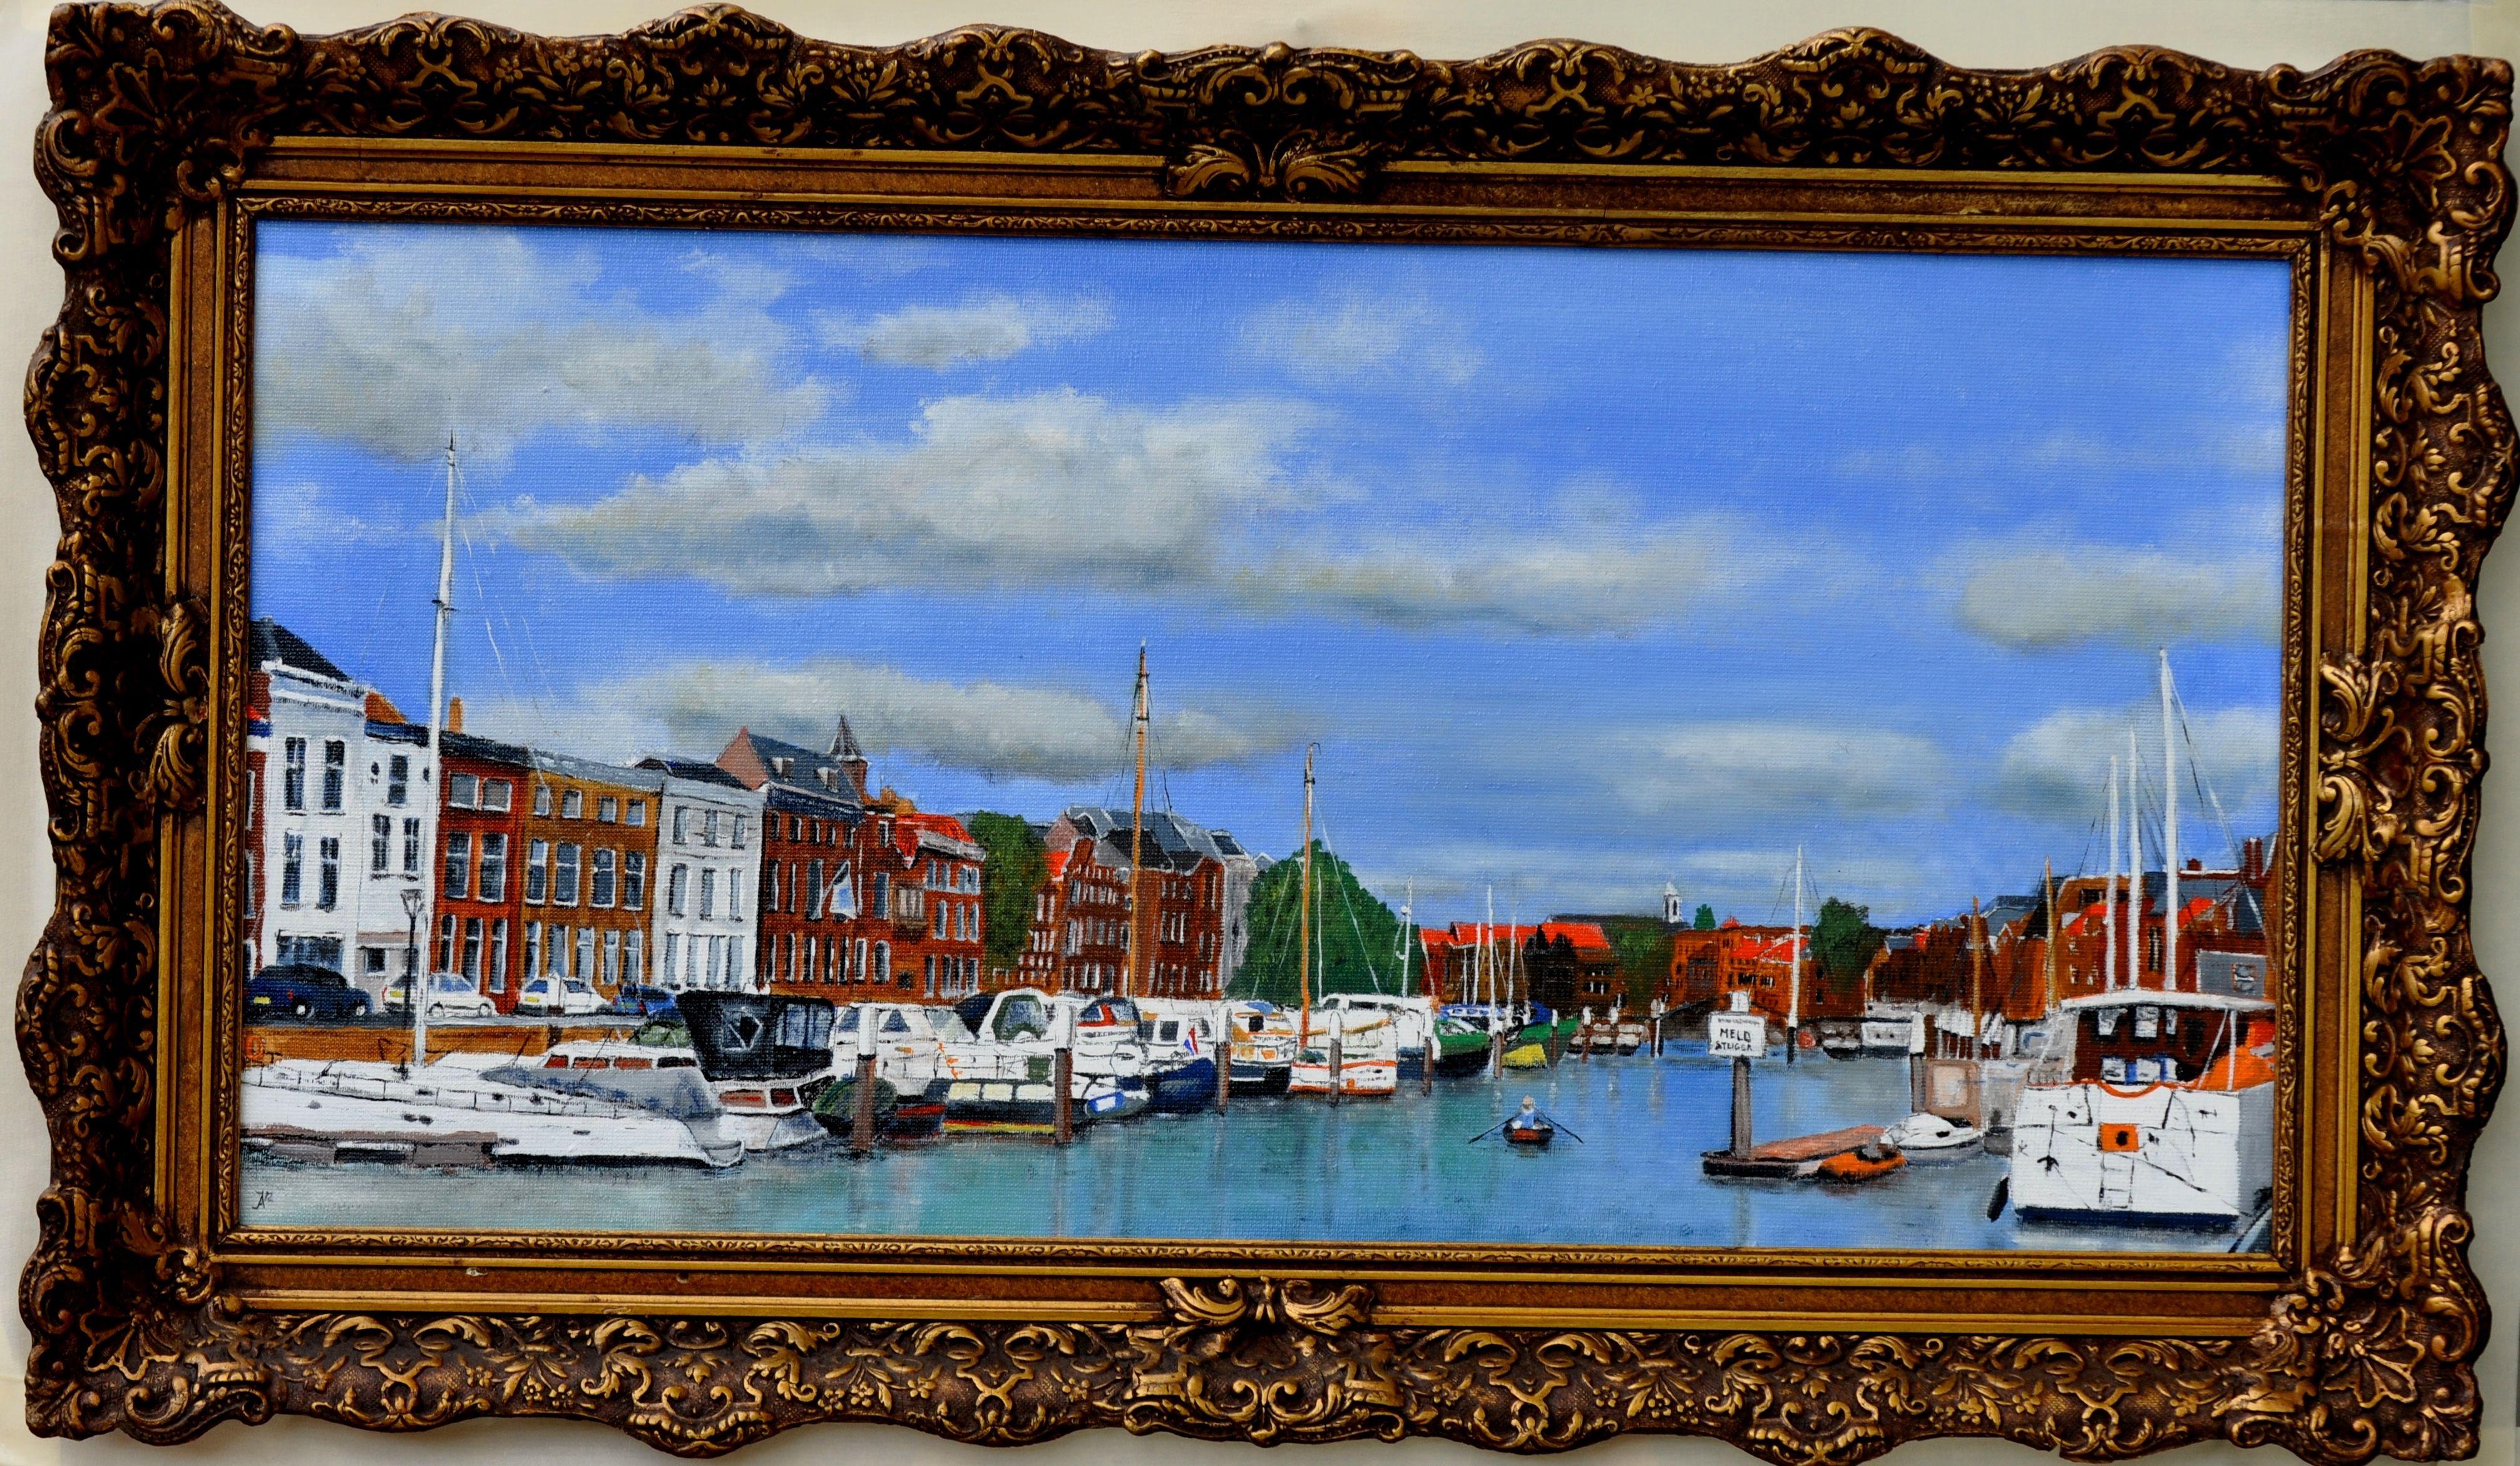 Nieuwehaven Dordrecht (olieverf op linnen 80 x 40 cm) https://www.facebook.com/Jan.Asmus.Painter